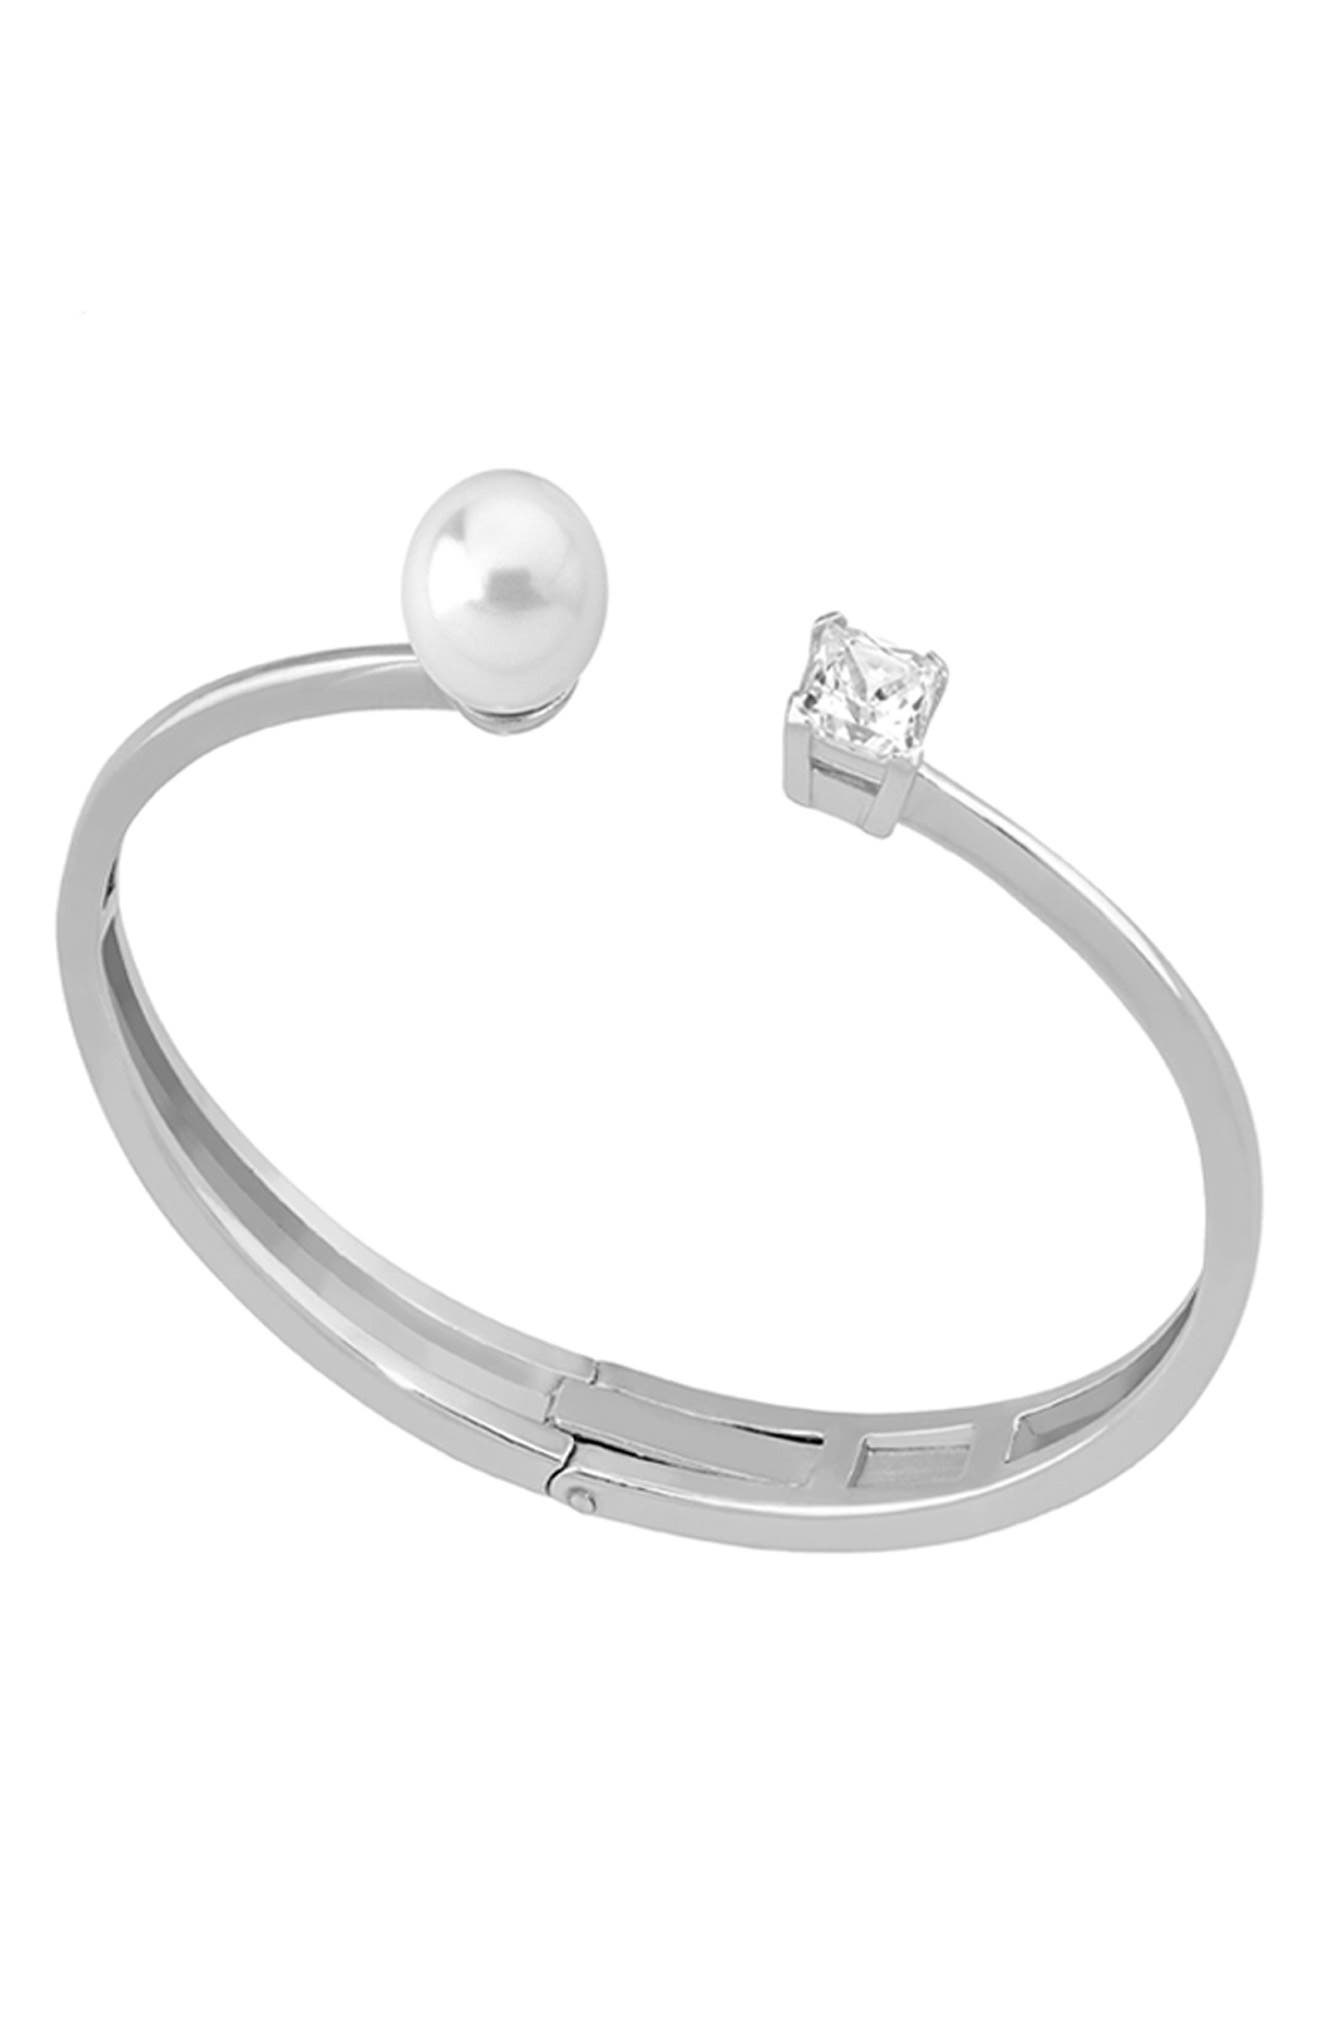 MAJORICA 10Mm Manmade Pearl & Cubic Zirconia Split Silver Bangle Bracelet in White/ Steel